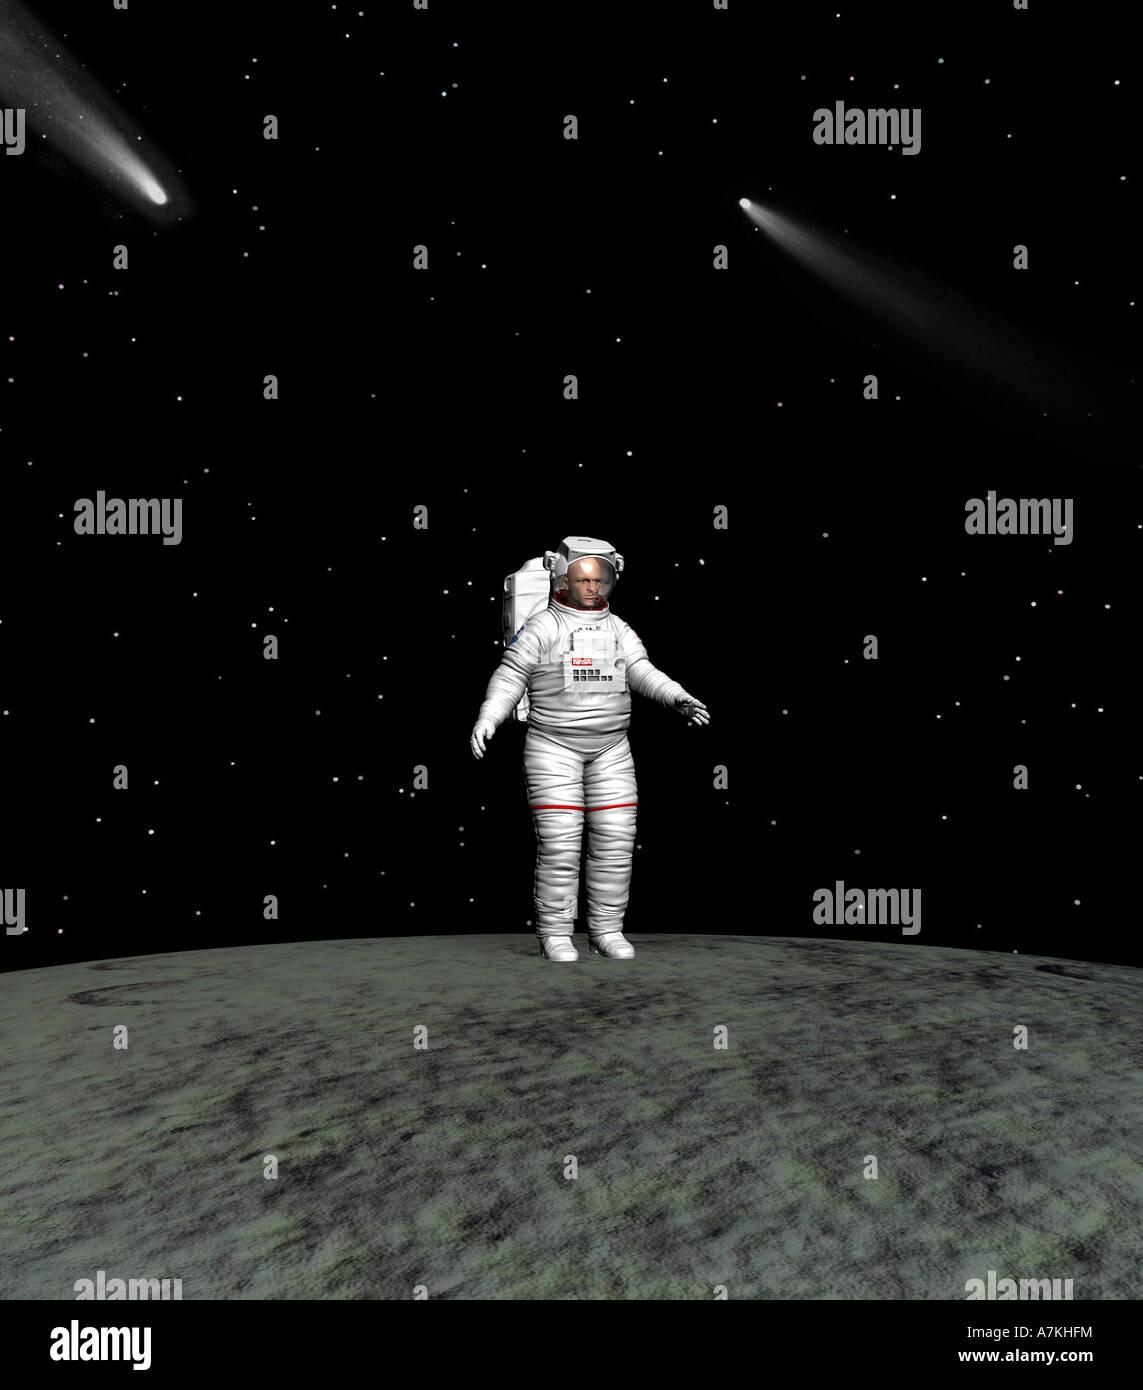 Spaceman Stockbild